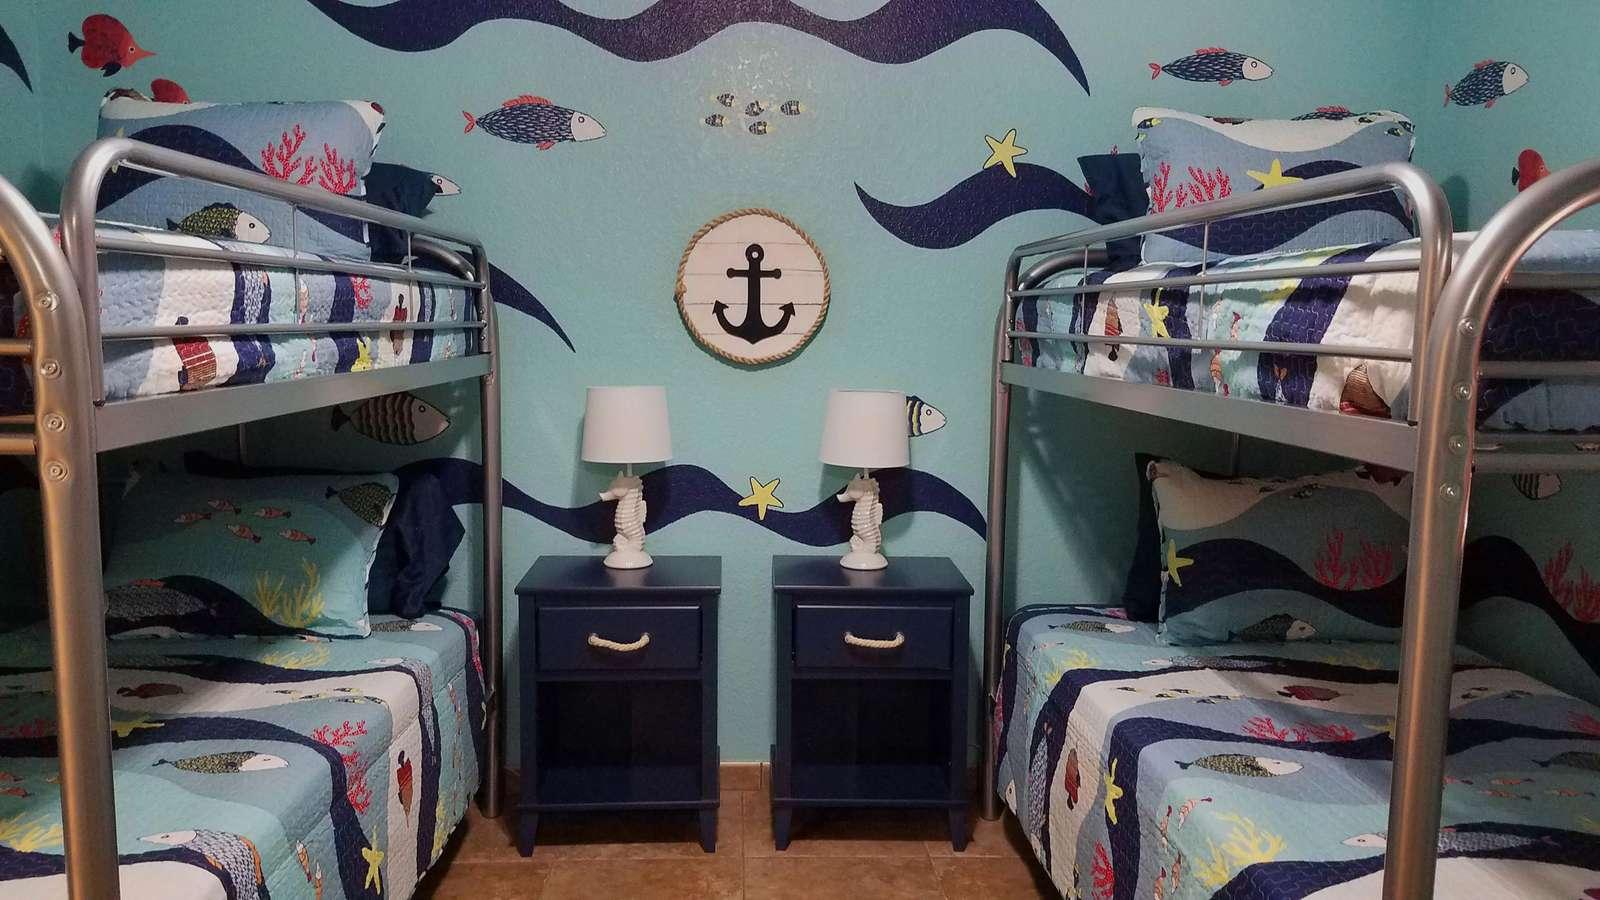 Under the sea room Sleeps 4 adults or 4-6 kids